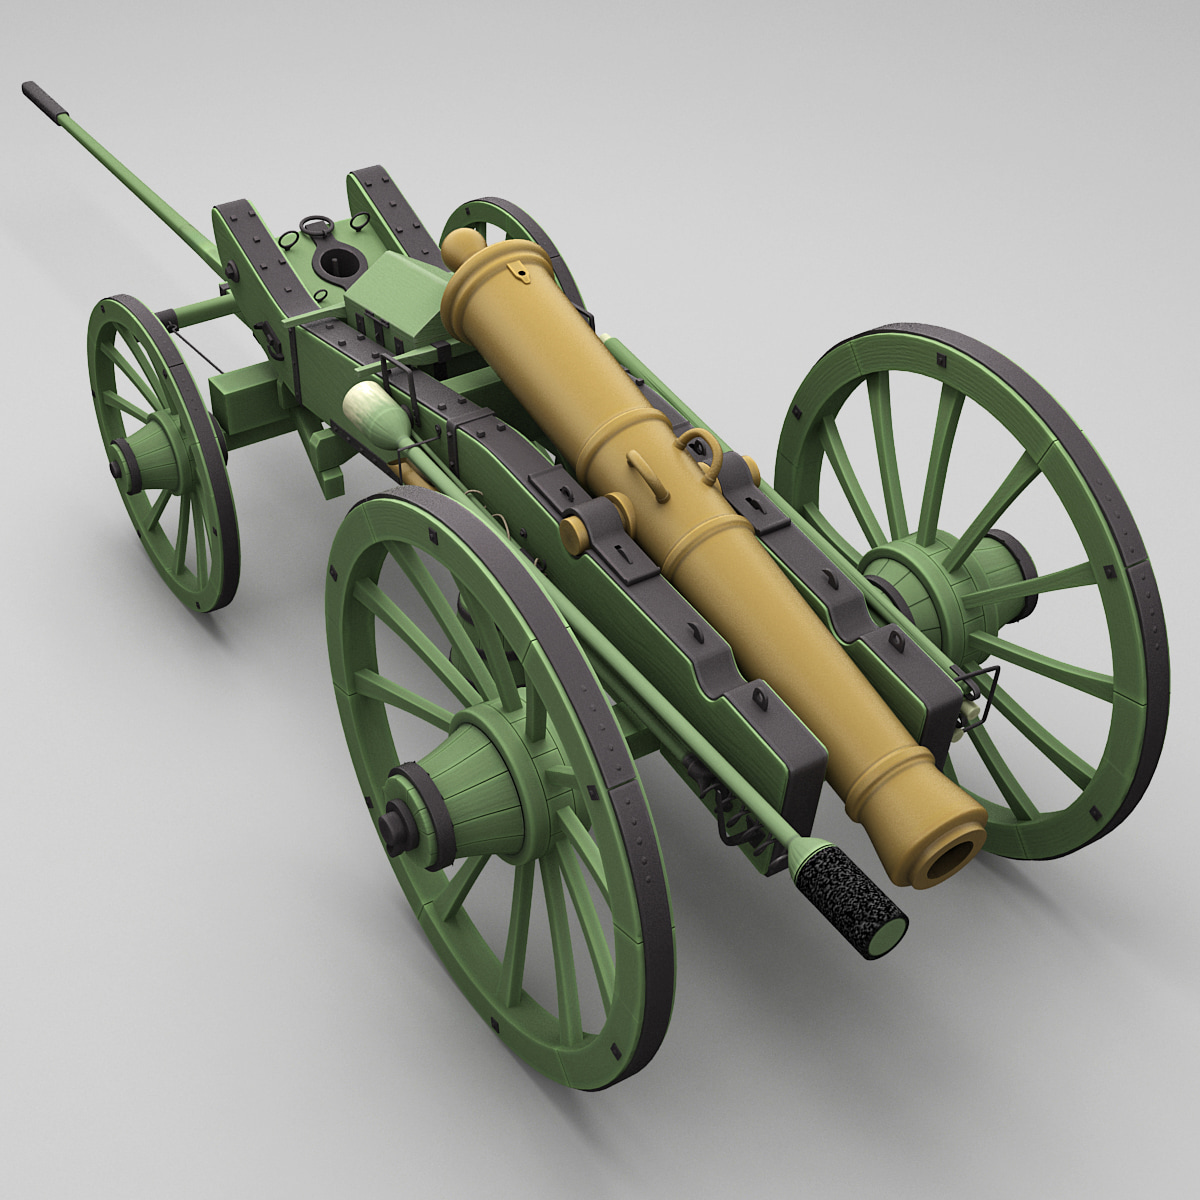 Napoleons_12-pdr_Gribeau_Field_Gun_Transport_Position_0001.jpg